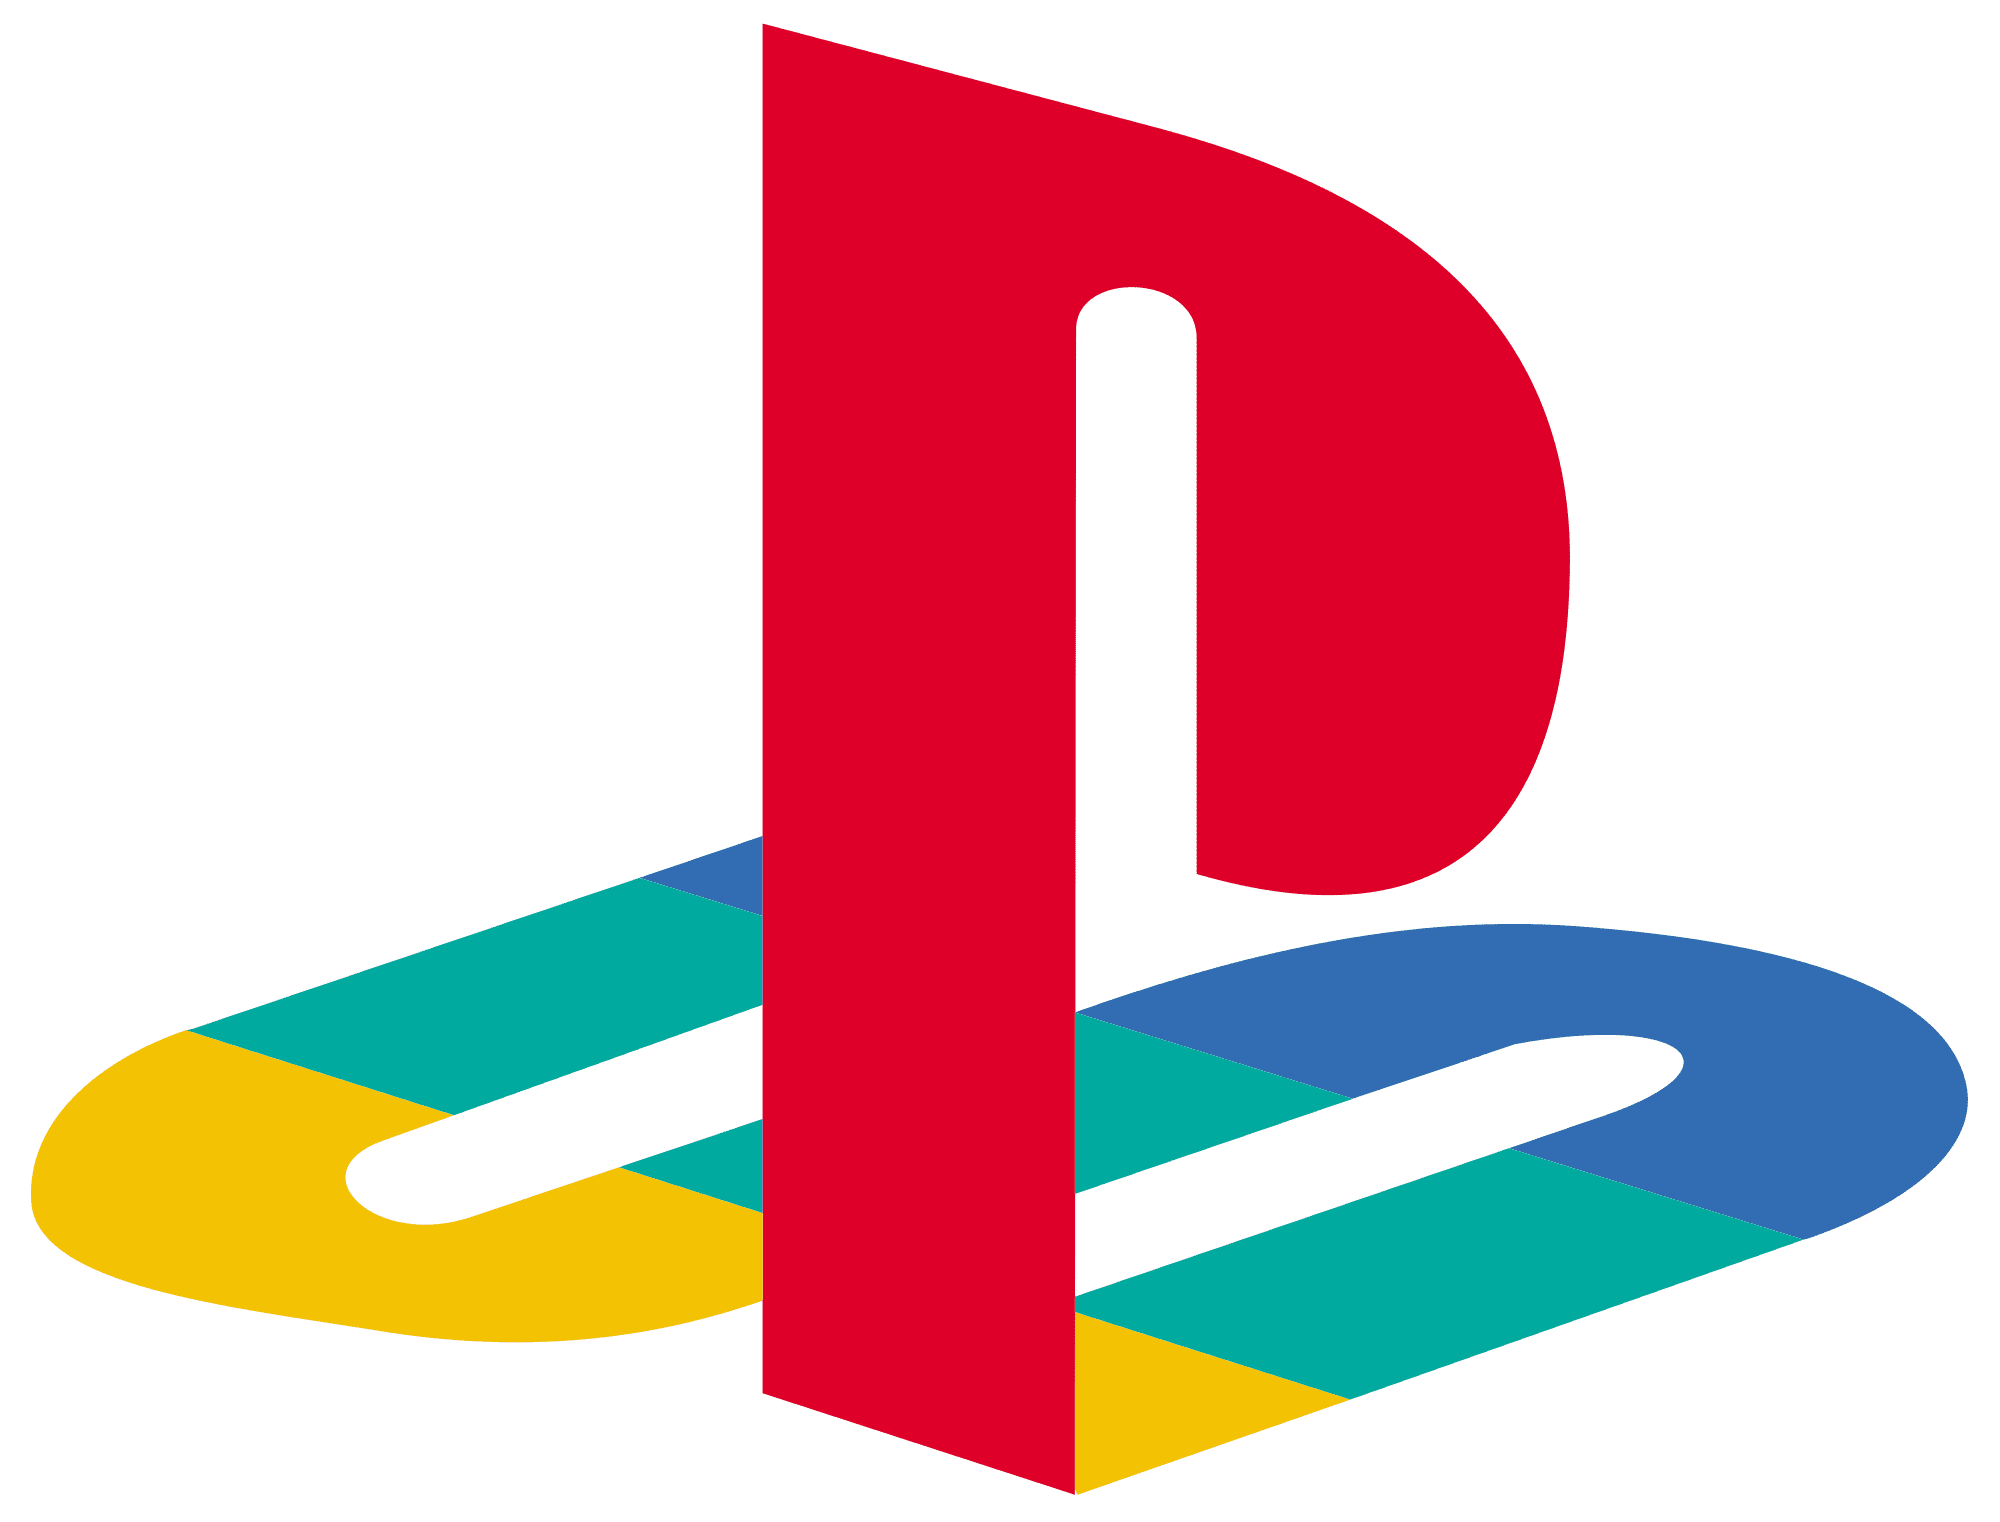 Historia del logo de PlayStation